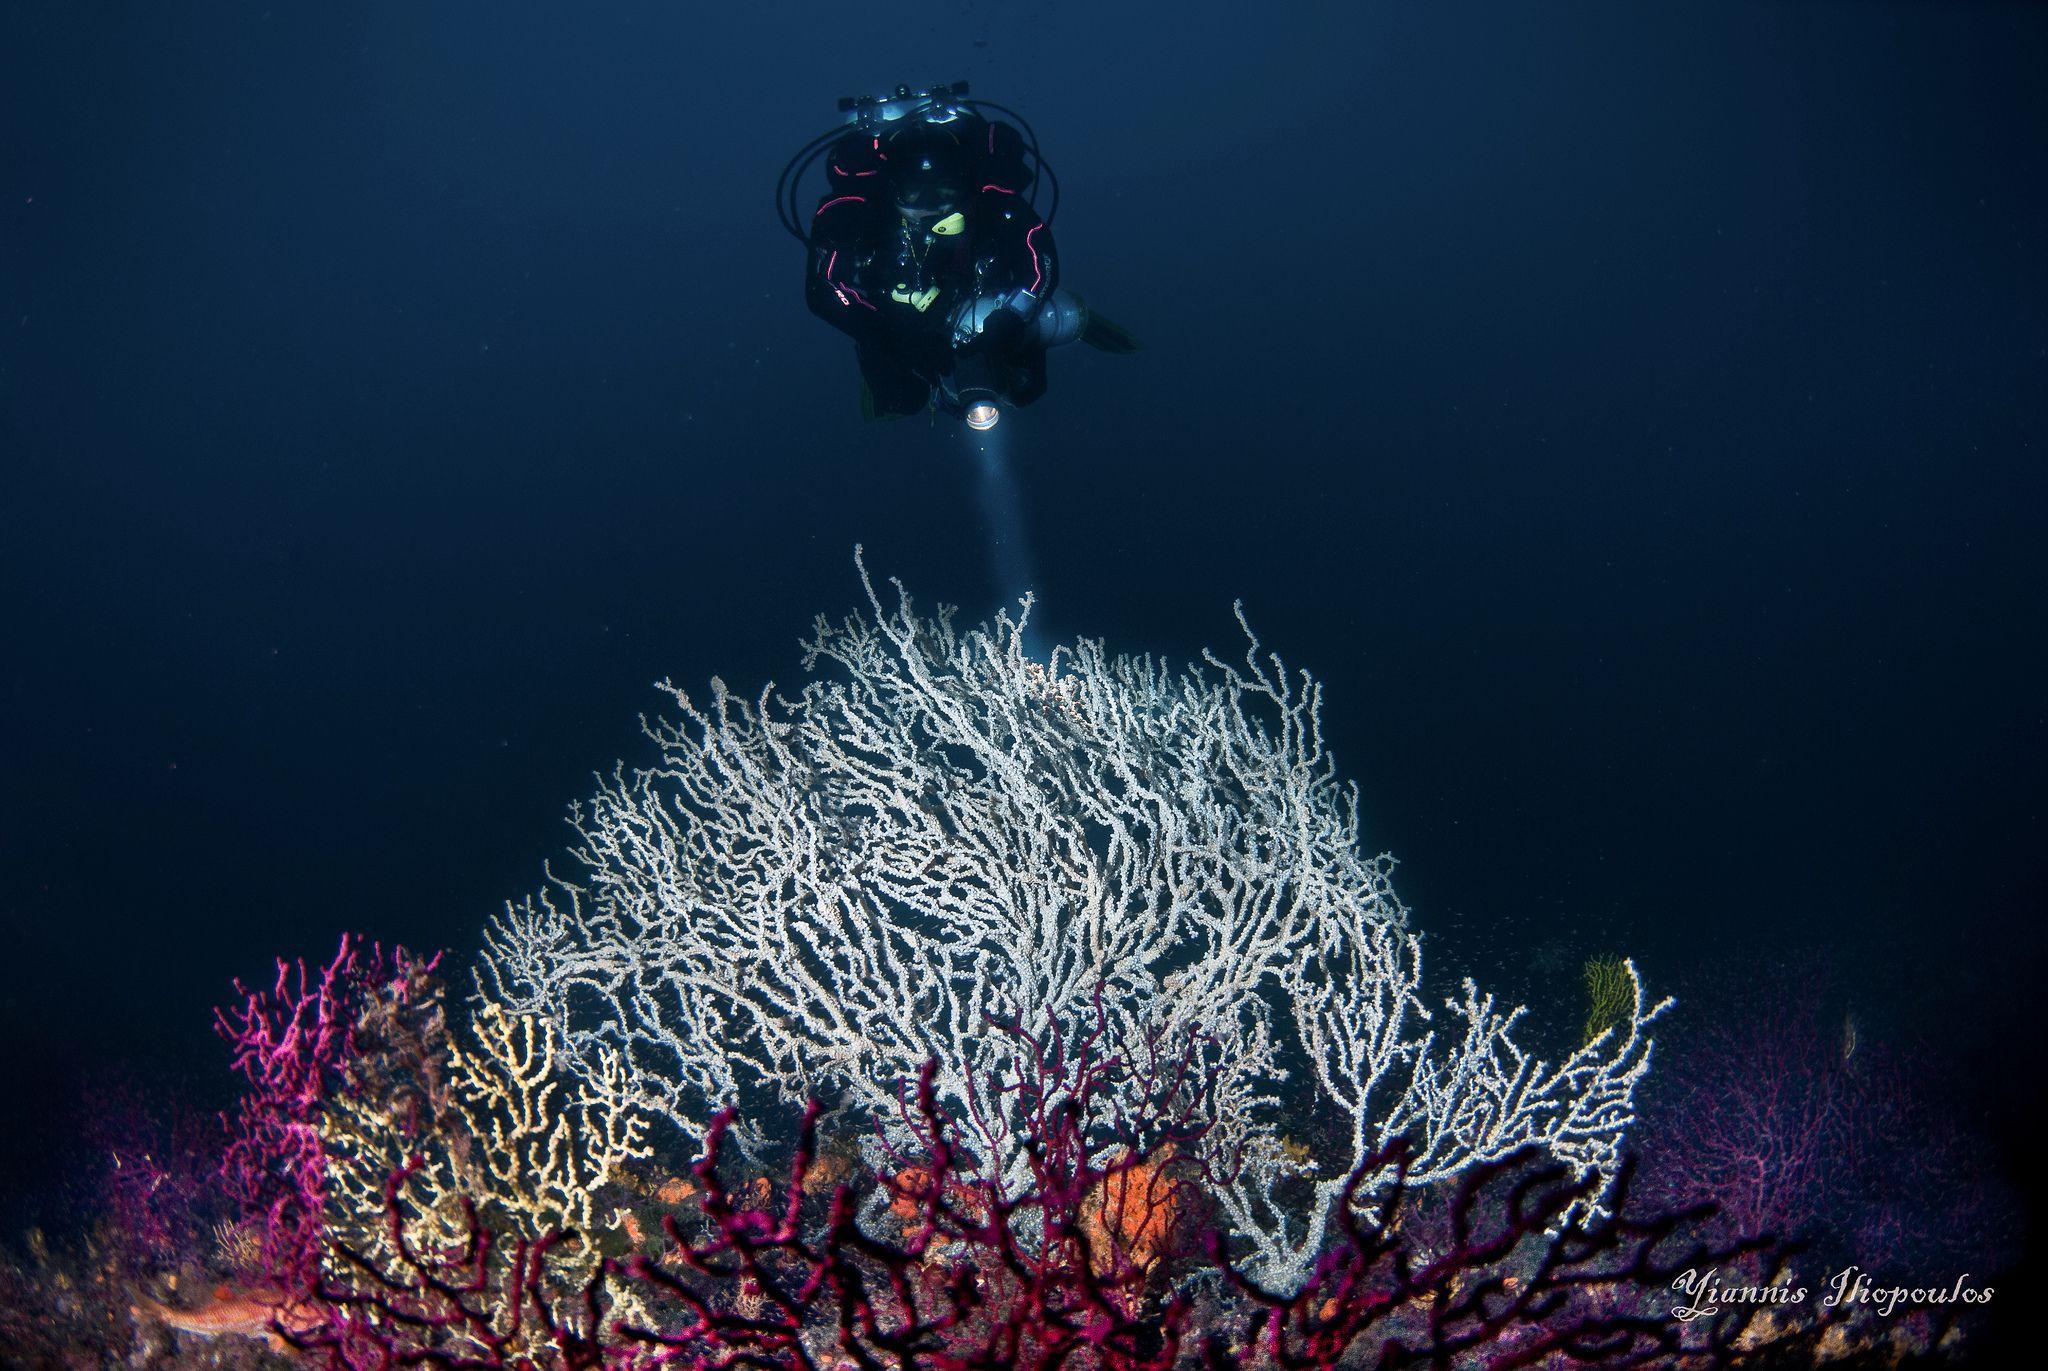 https://flic.kr/p/zwzGzD | Gorgonians | Gorgonians Eunicella verrucosa (white gorgonian) , Eunicella cavolini (yellow gorgonian) and  Paramuricea clavata (purple gorgonian) . Location Greece - Depth : 62 m Underwater Photography by Yiannis Iliopoulos